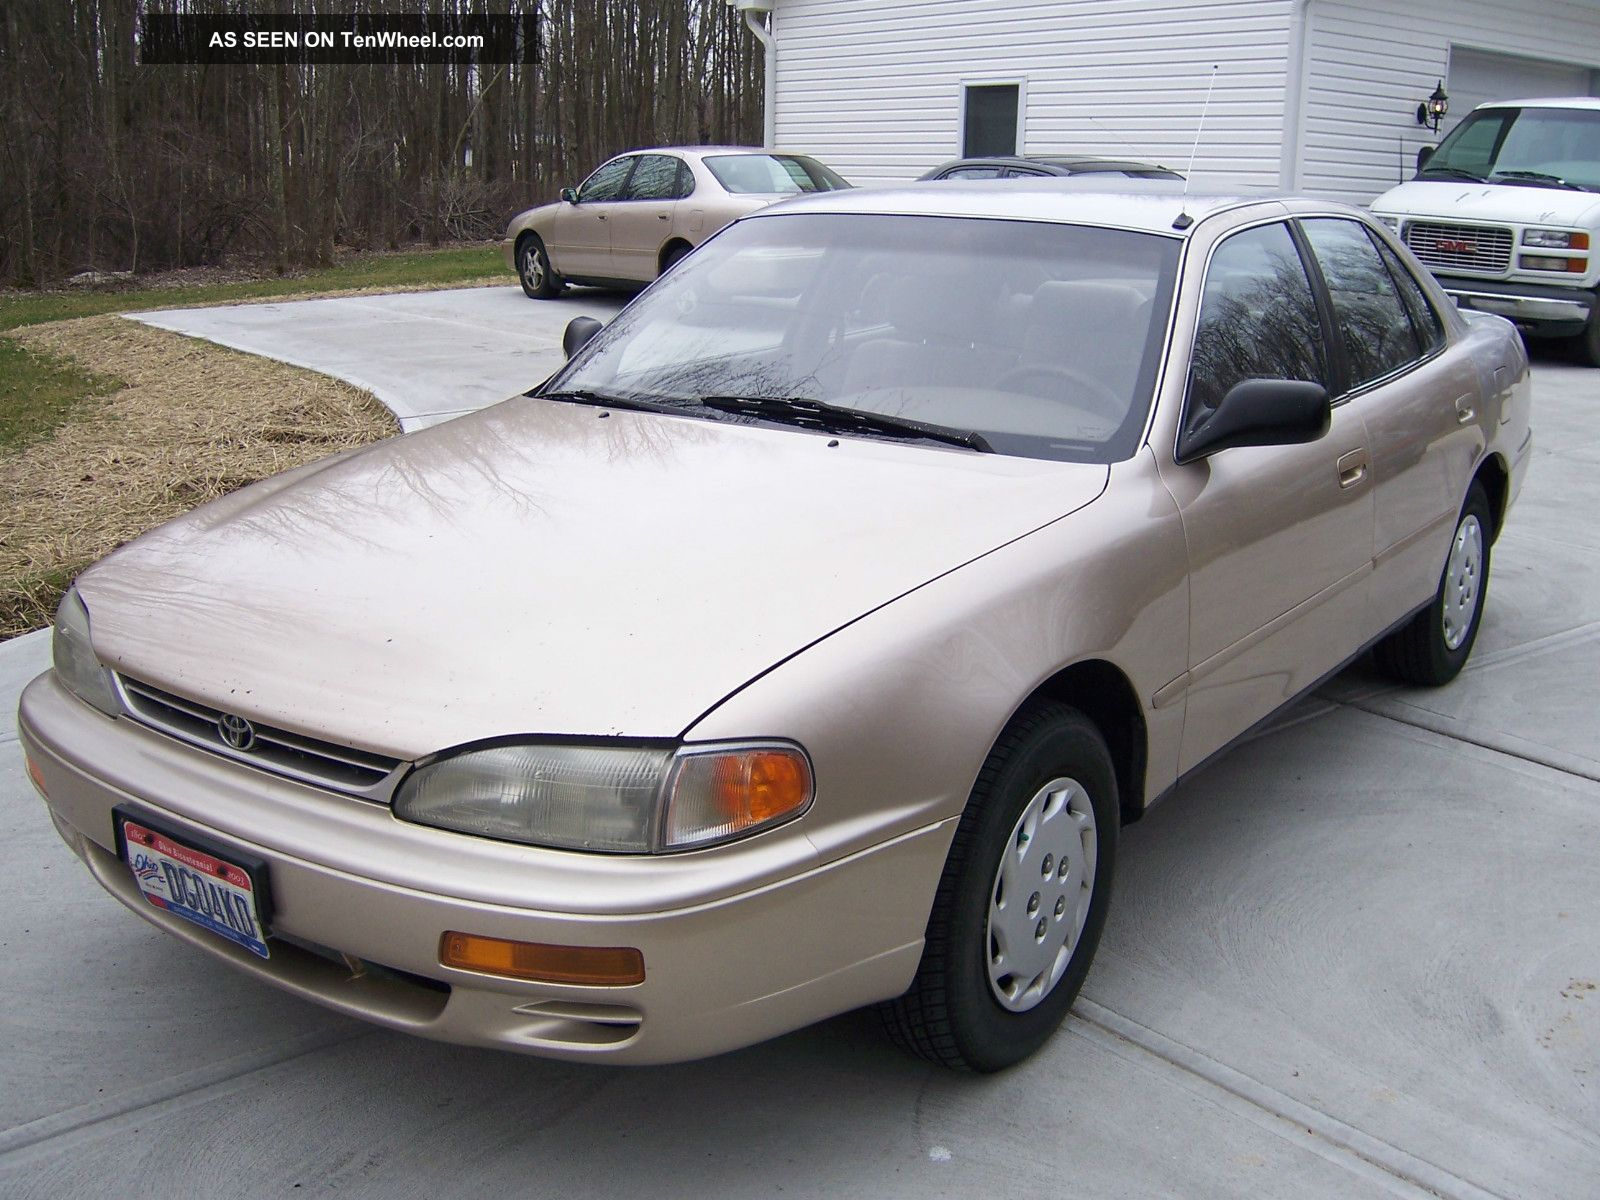 Toyota Camry 1996 Sedan 1996 Toyota Camry dx Sedan 4